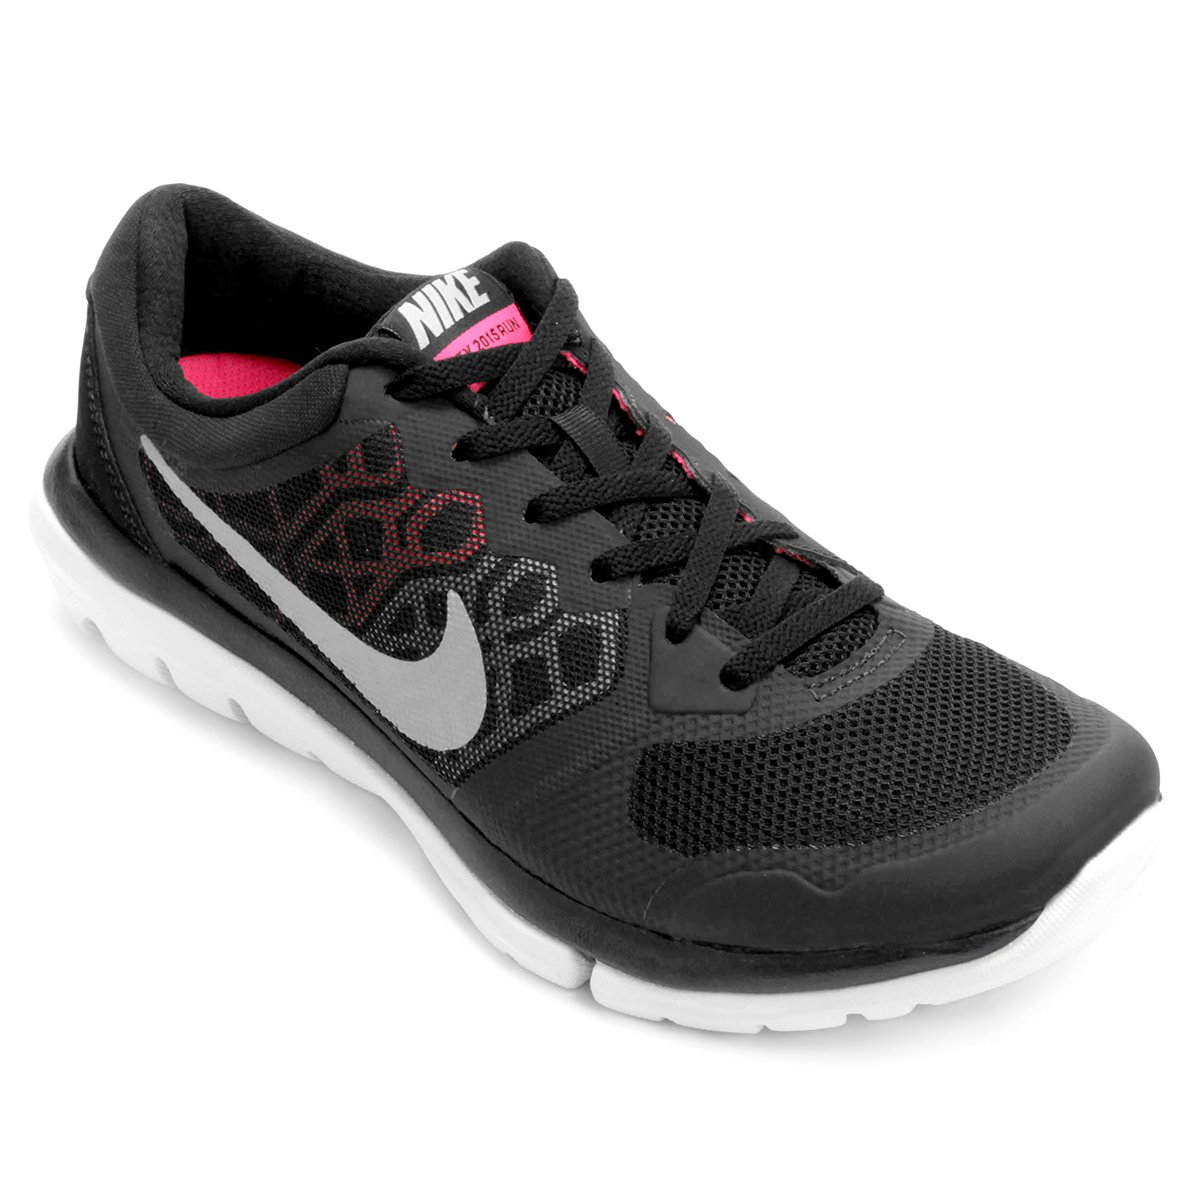 fb76233644b0 Tênis Nike Flex 2015 RN MSL Feminino - Compre Agora